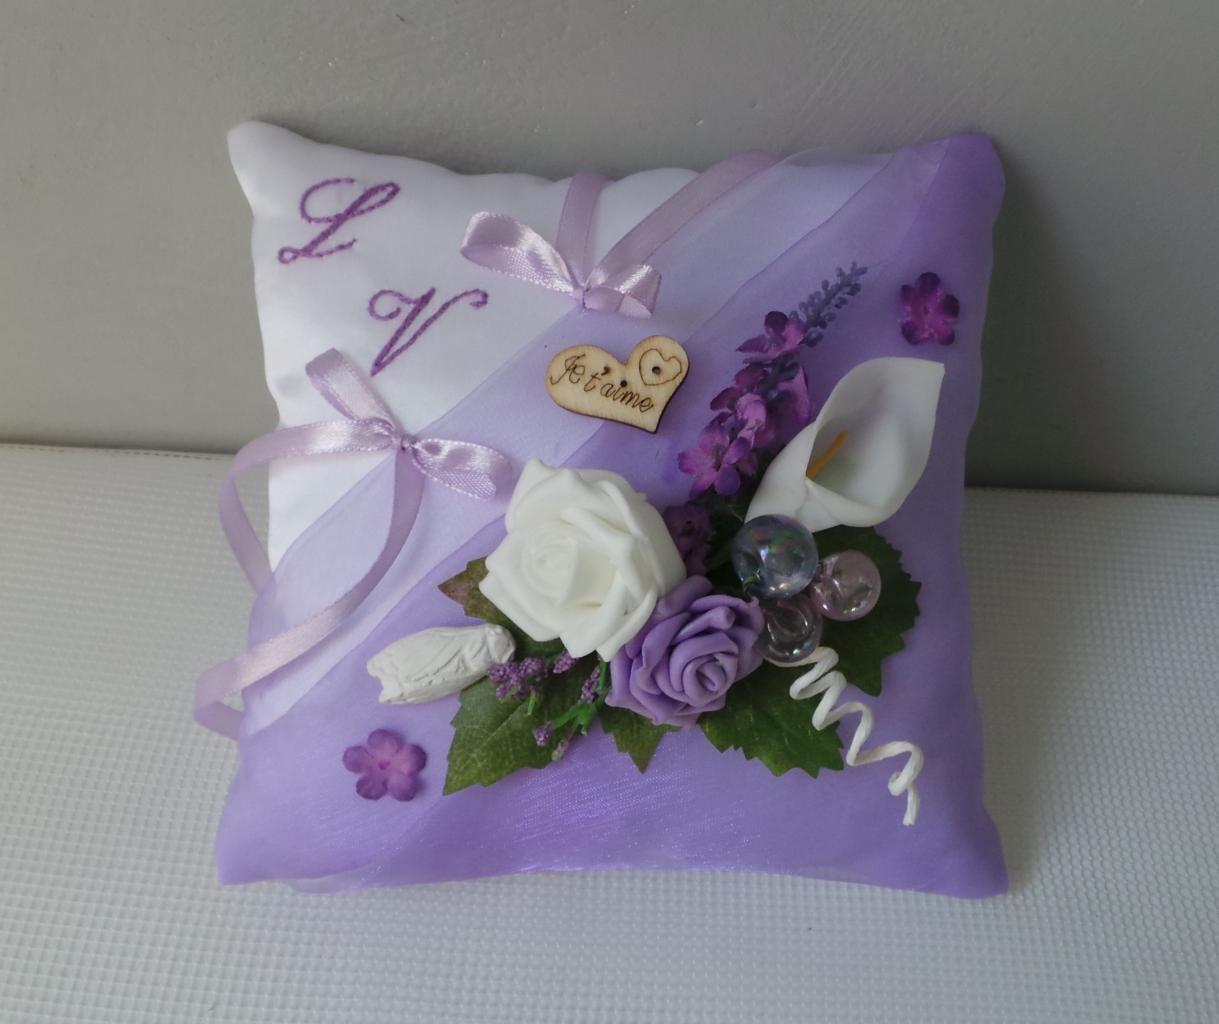 Coussin alliance personnalise parme violet champetre provence